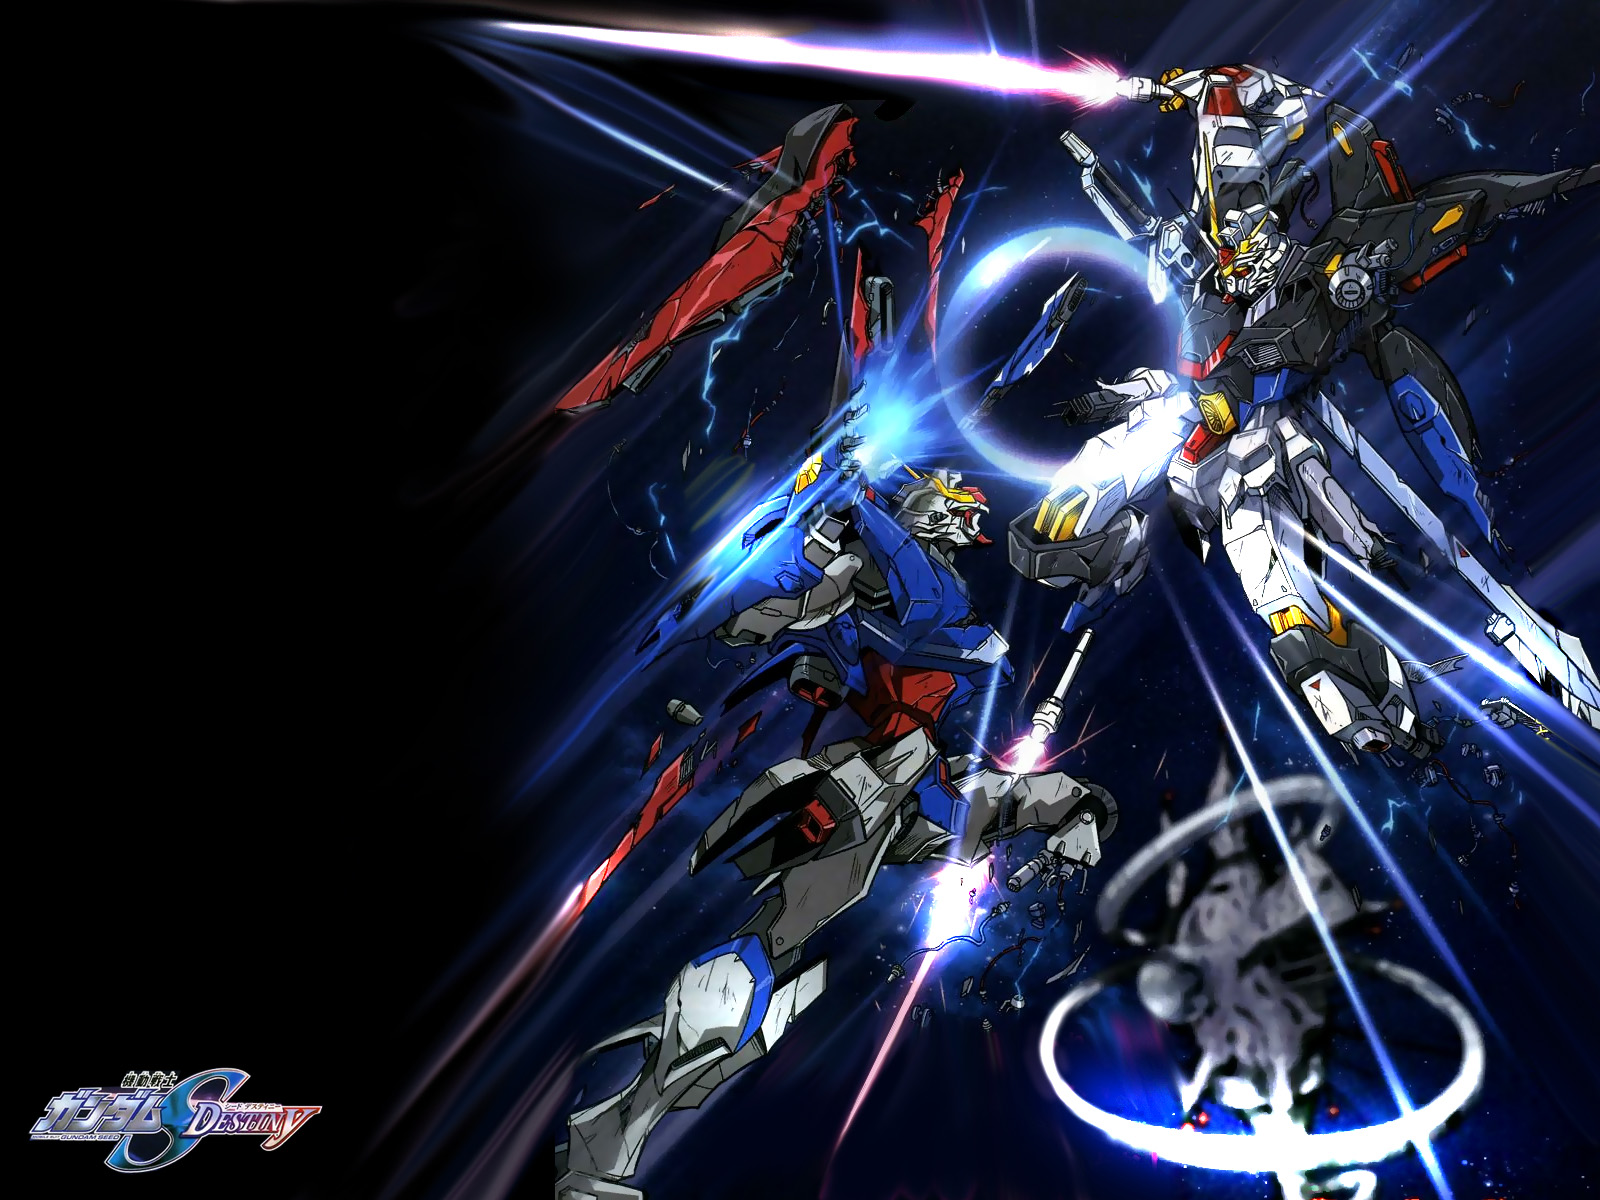 Download Wallpaper 1080x1920 Gundam seed, Alacus clyne, Cagalli ...